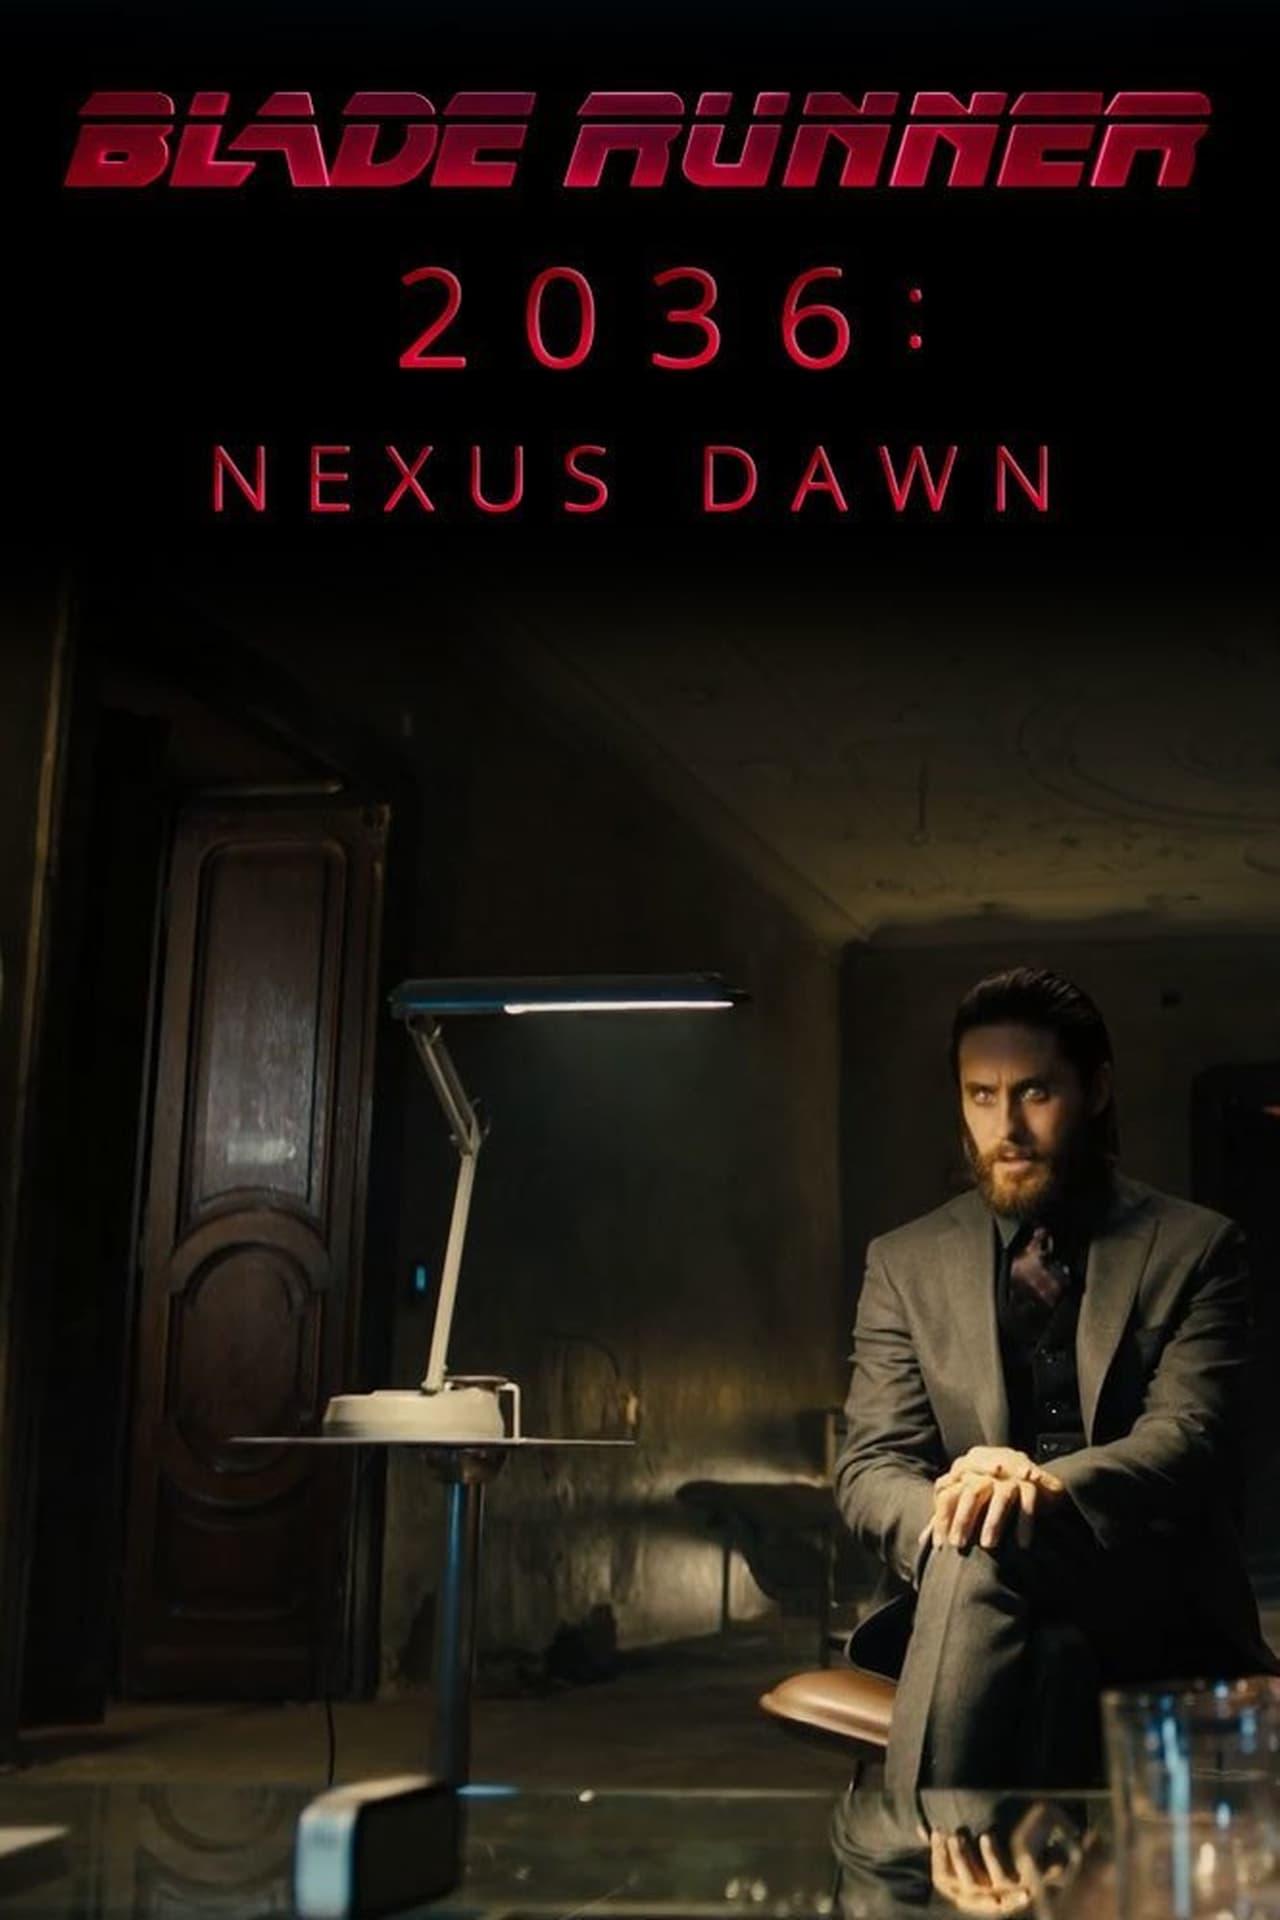 nexus dawn subtitles